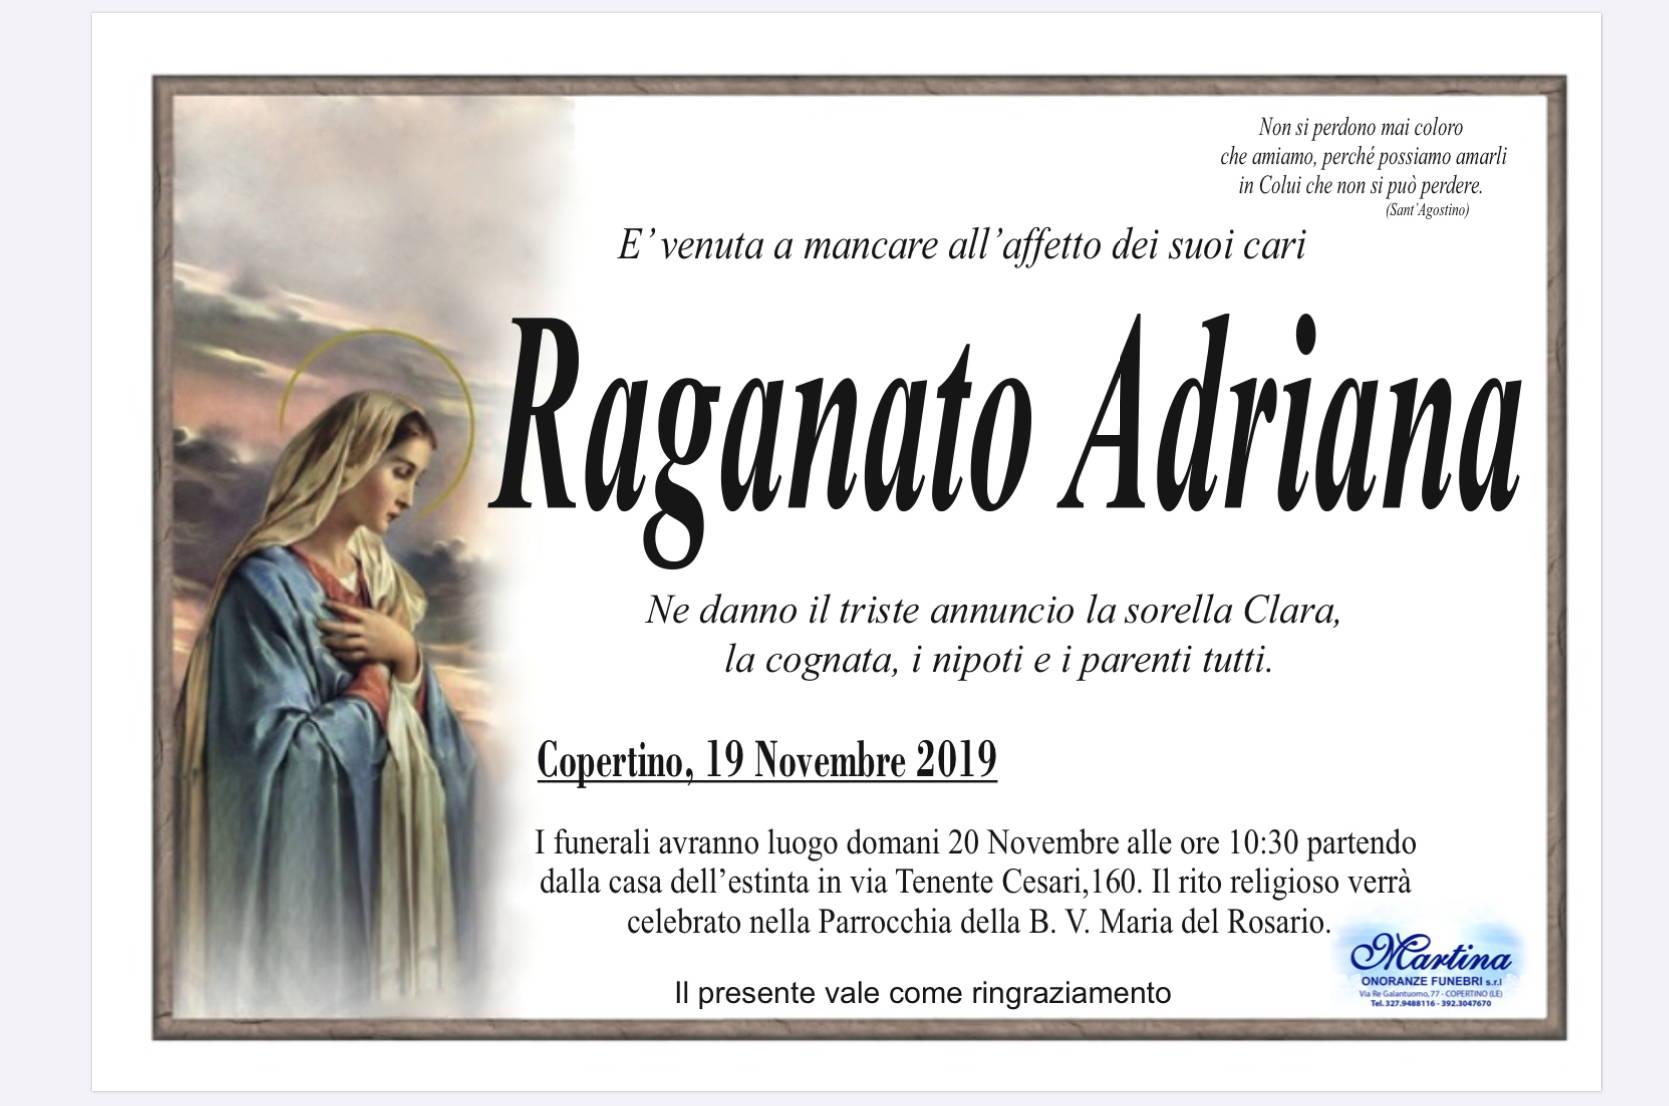 Adriana Raganato